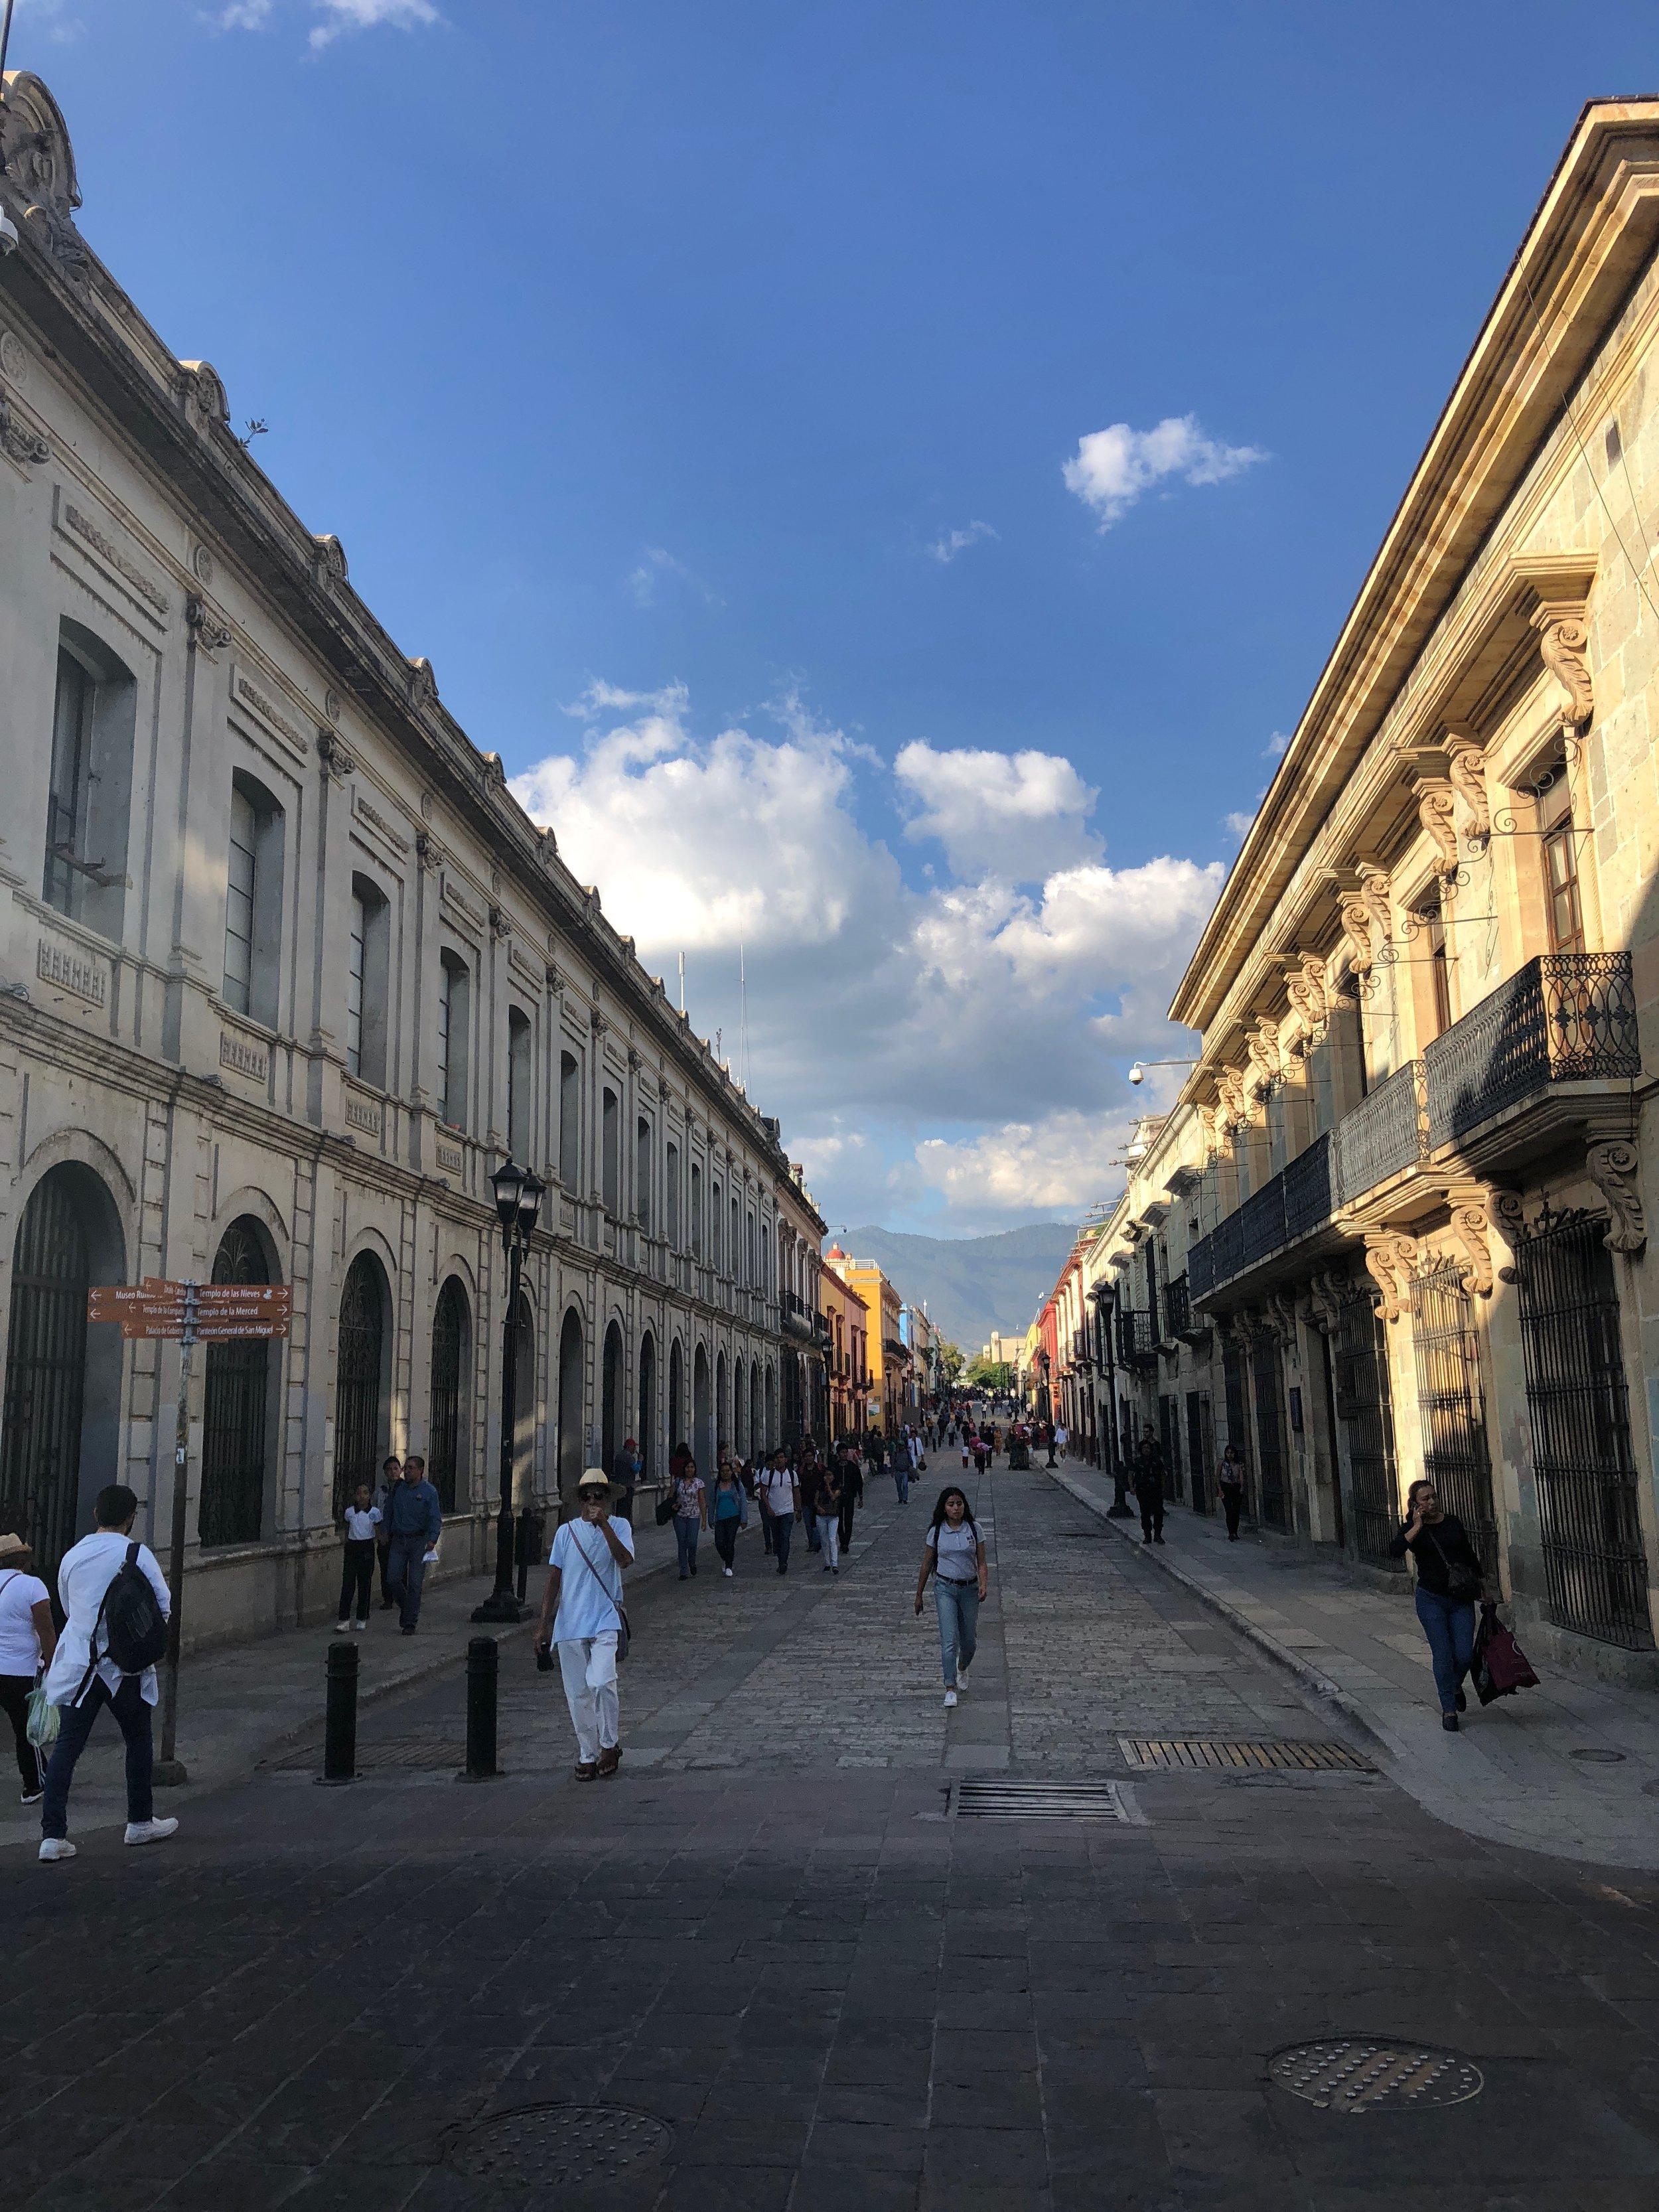 A view of Alcala - the pedestrian street